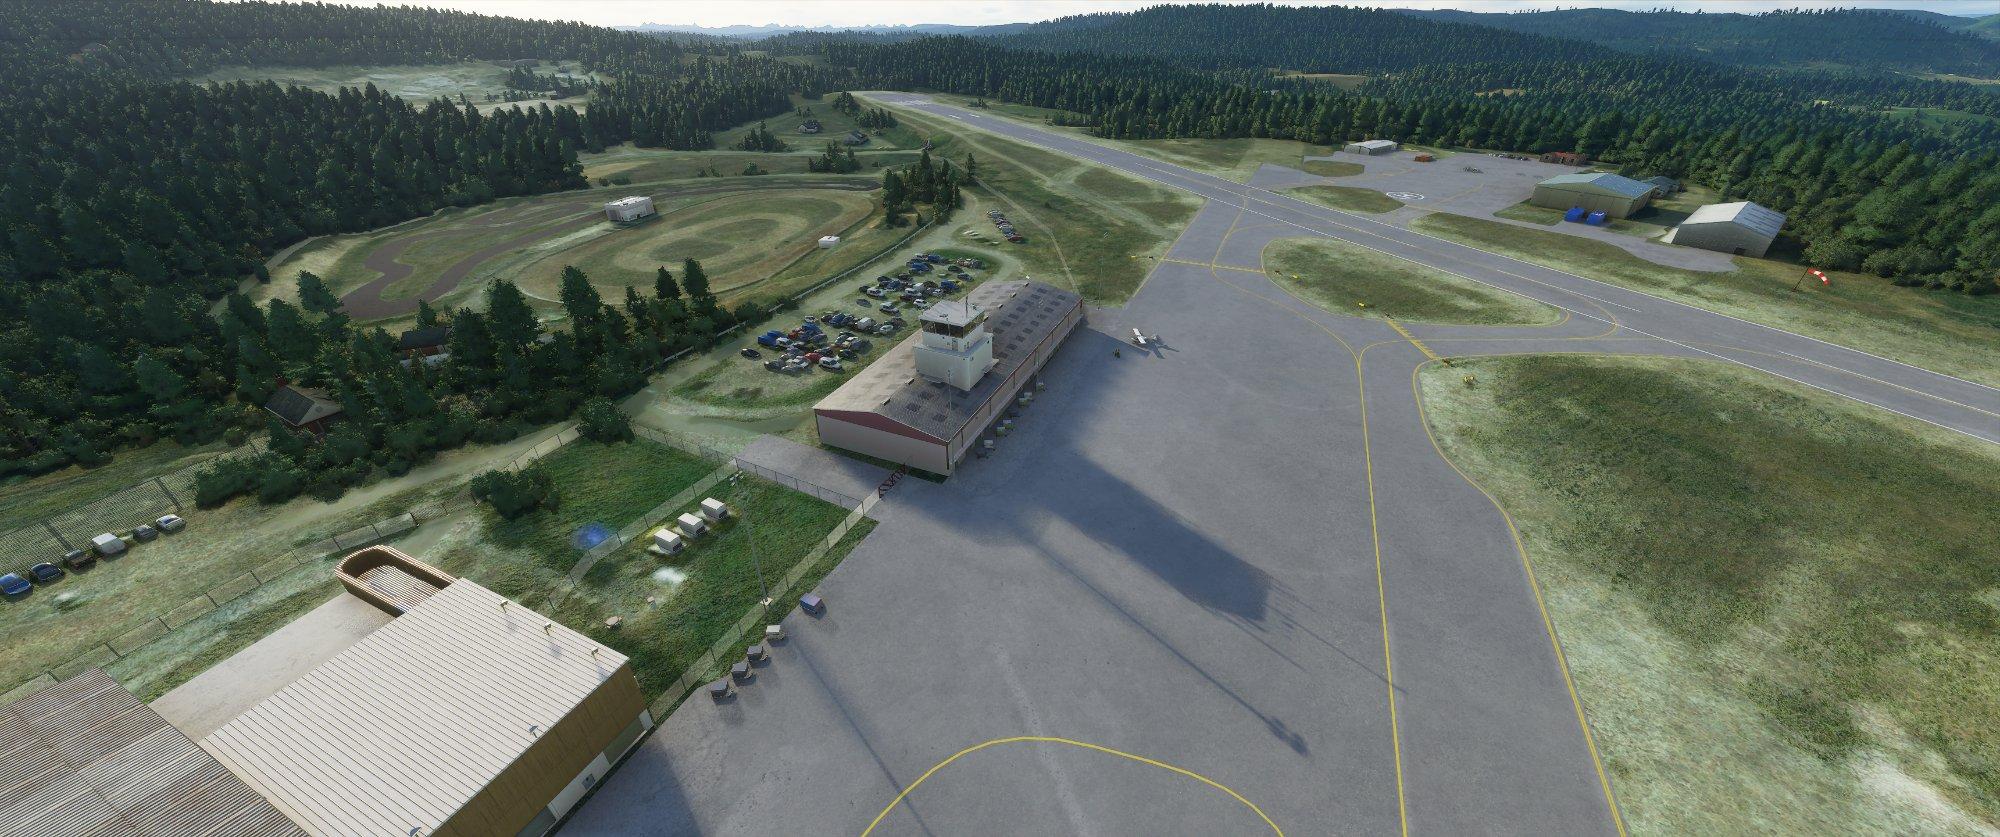 Microsoft Flight Simulator Screenshot 2020.10.28 - 11.40.21.77.jpg